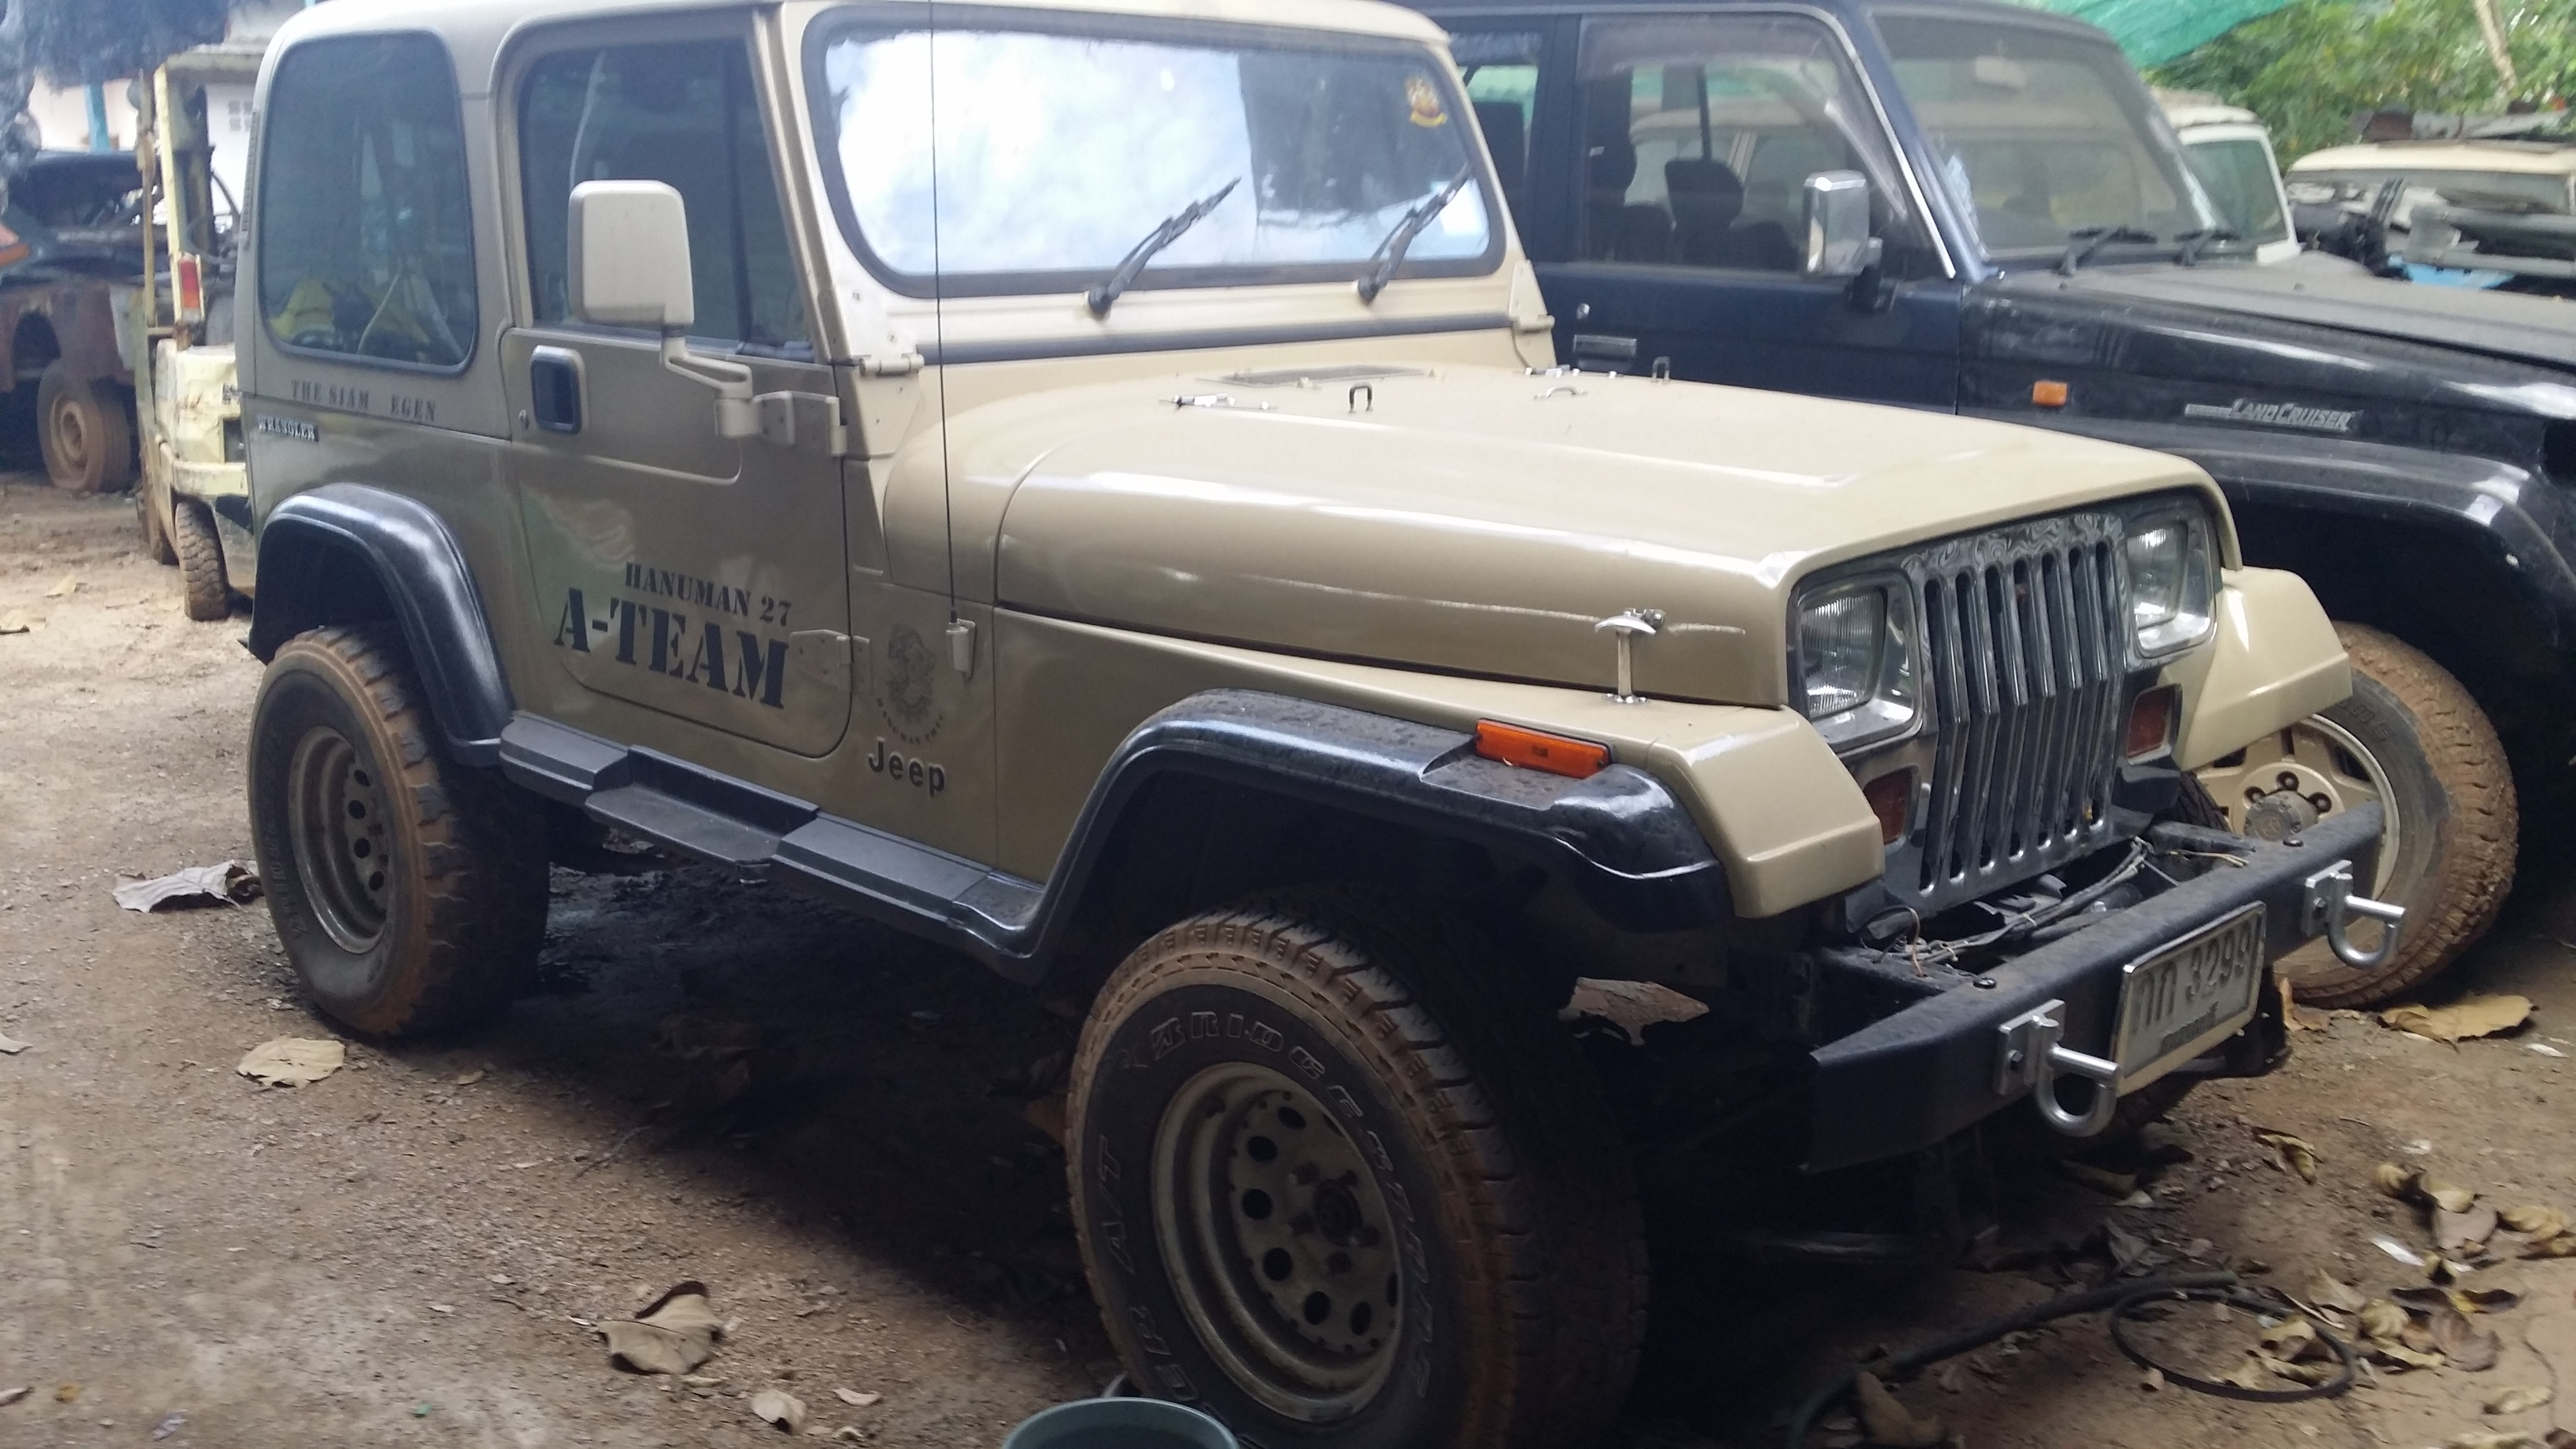 rent mt mountain expeditions rentals bozeman rocky top rental no jeep wrangler a exterior car